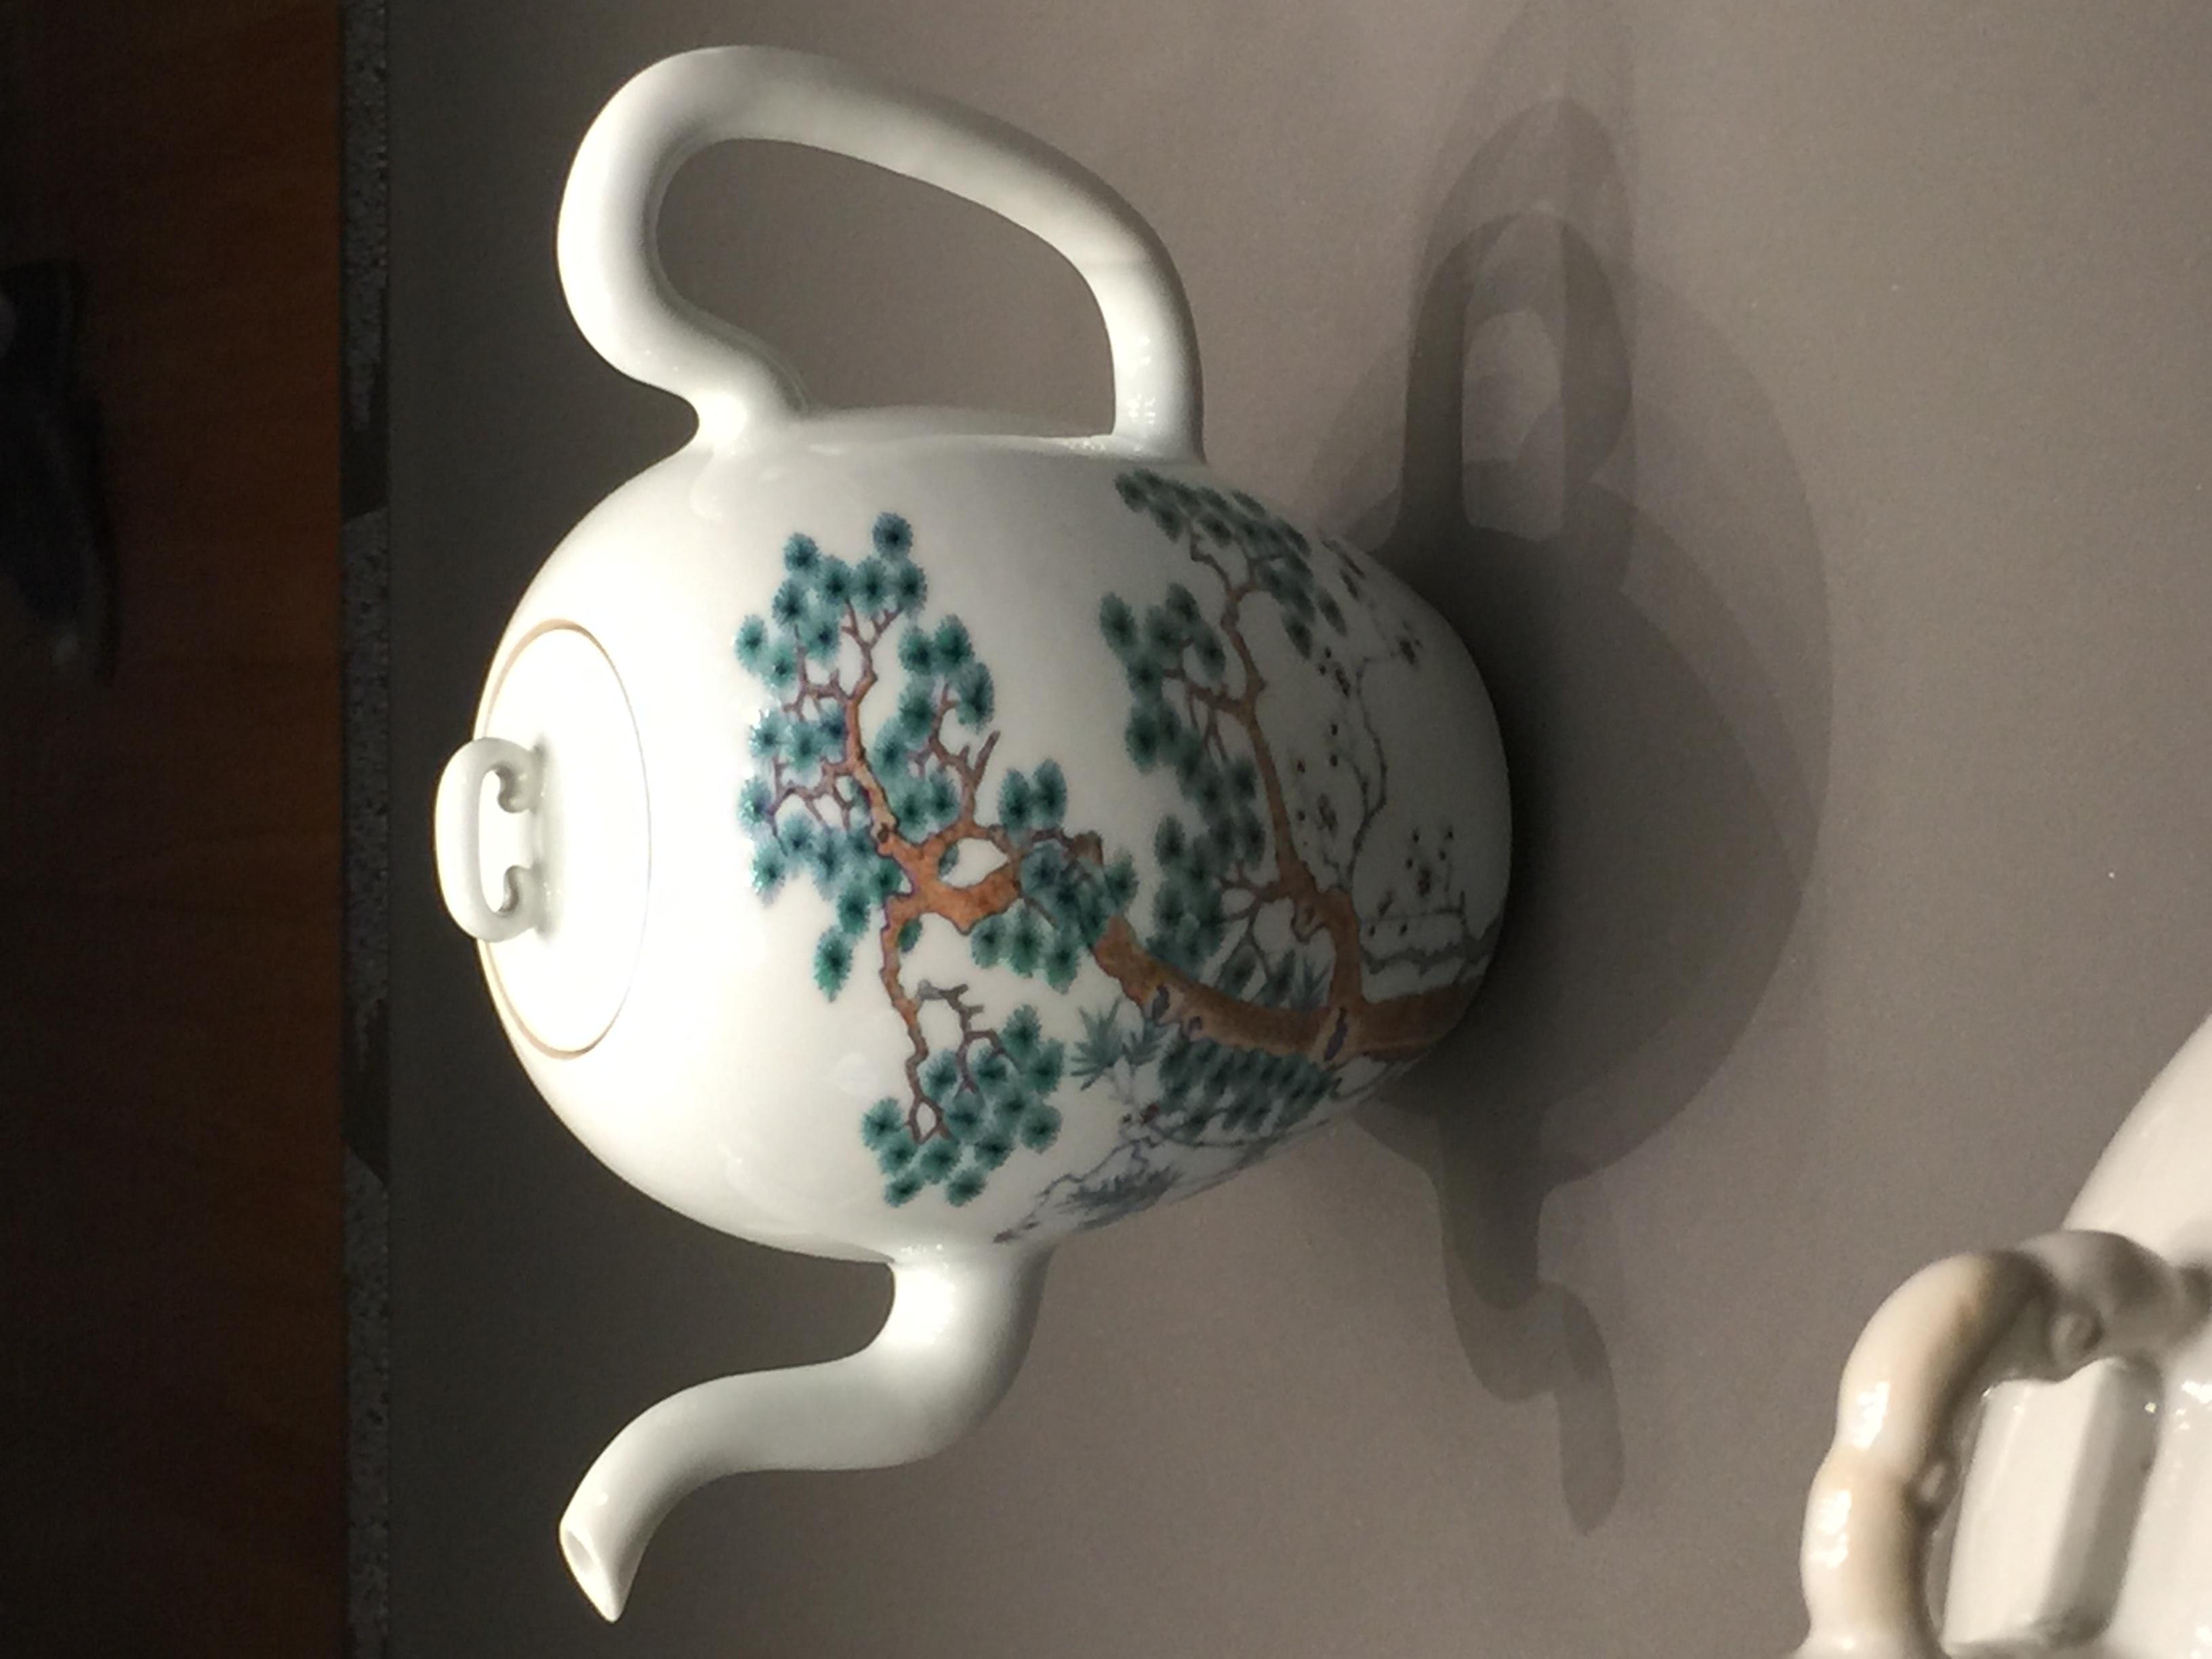 Chinese-Porcelain-British-Museum-Percival-David-jessewaugh.com-120.jpg